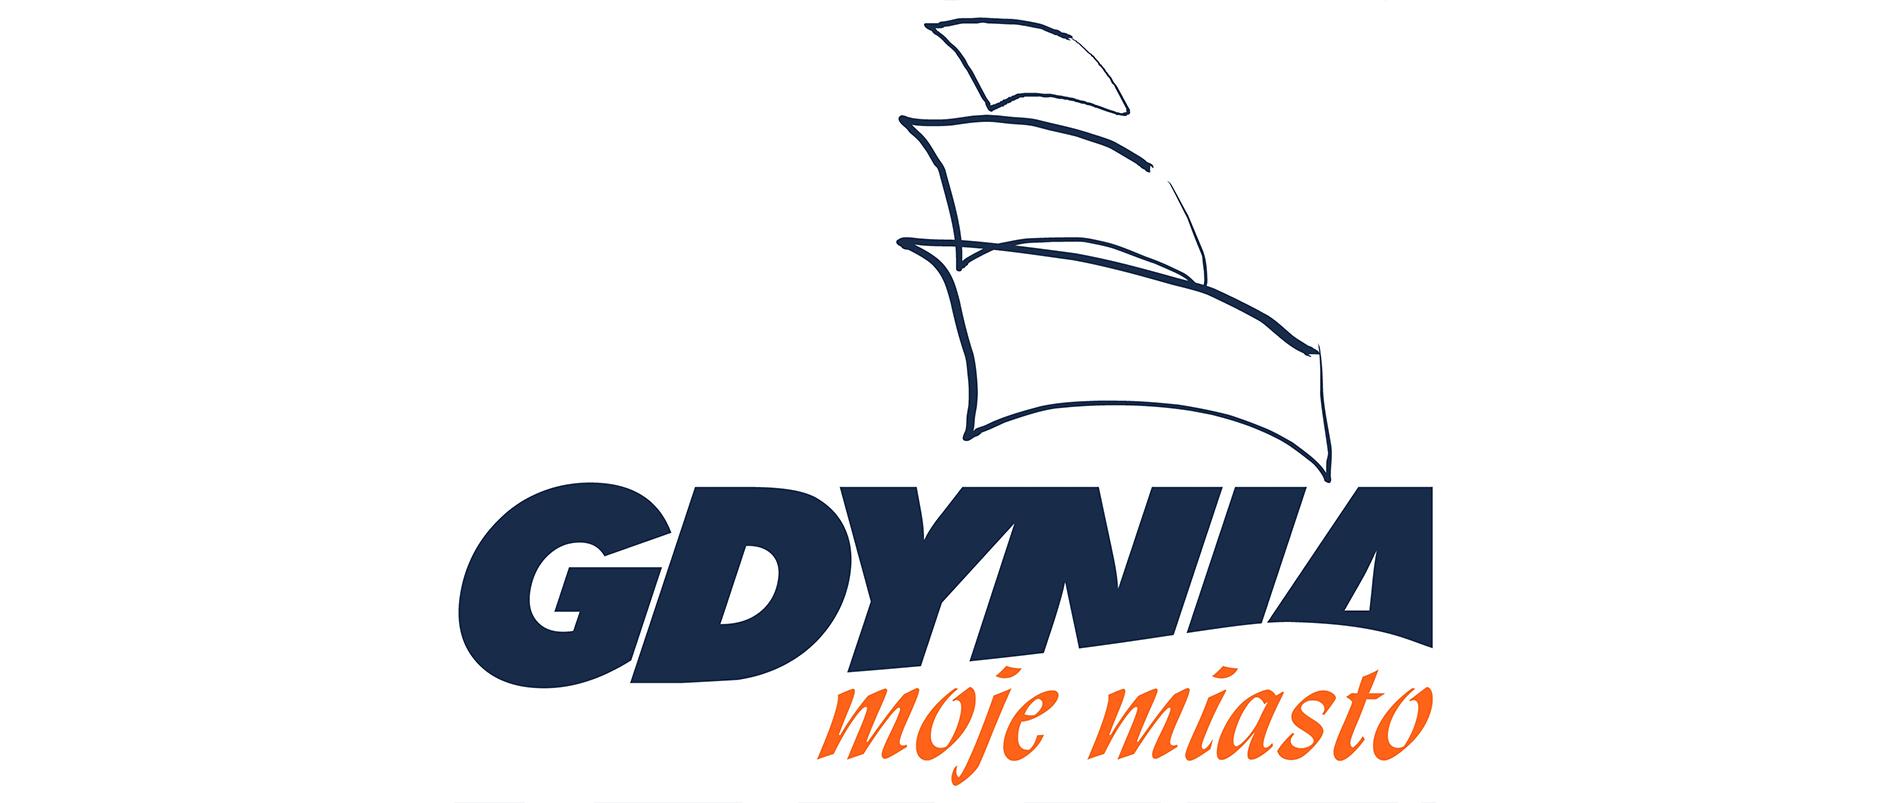 Miasto Gdynia